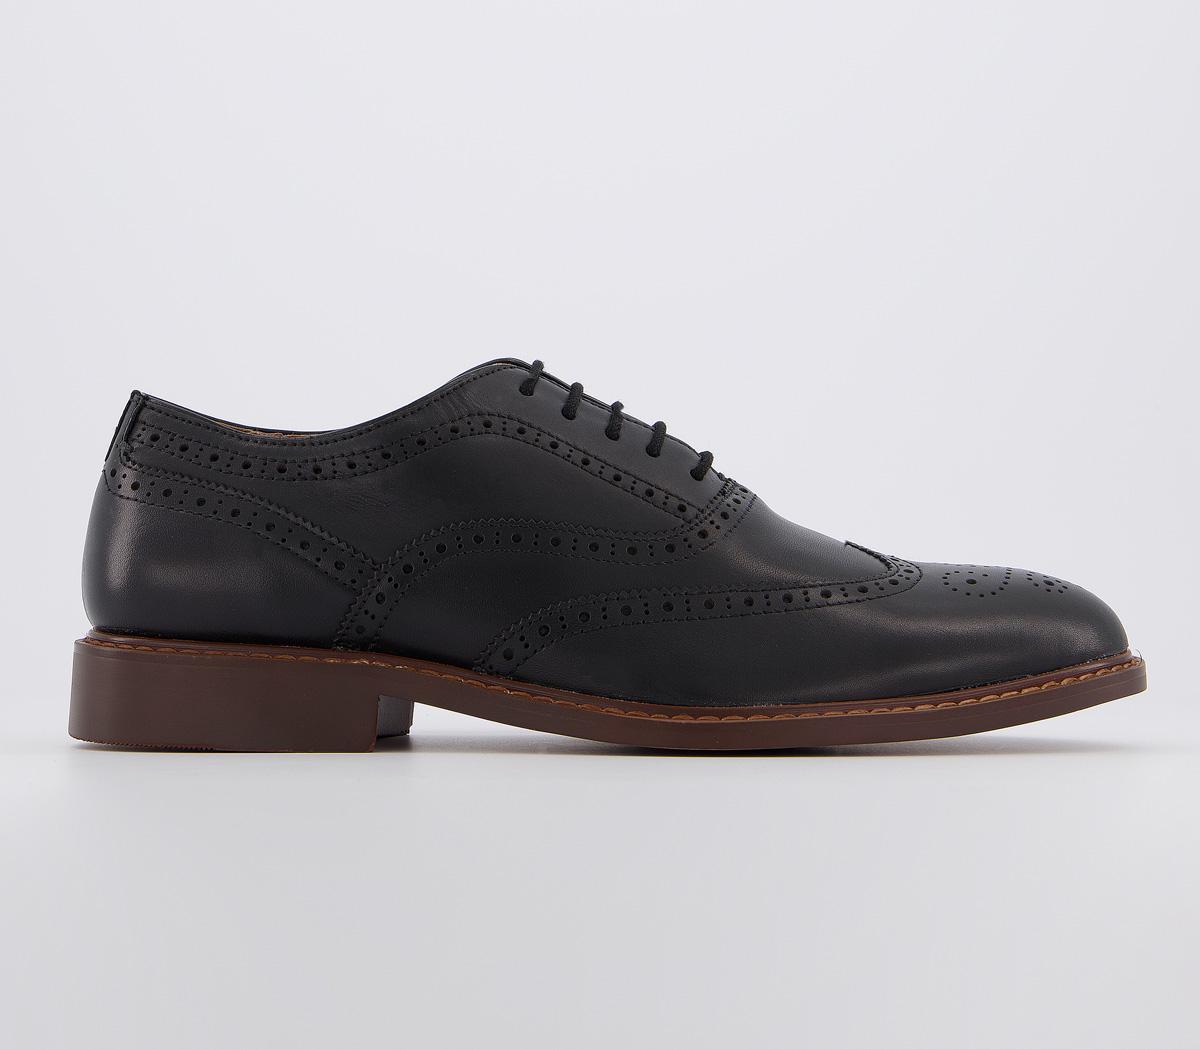 Mean Brogue Shoes